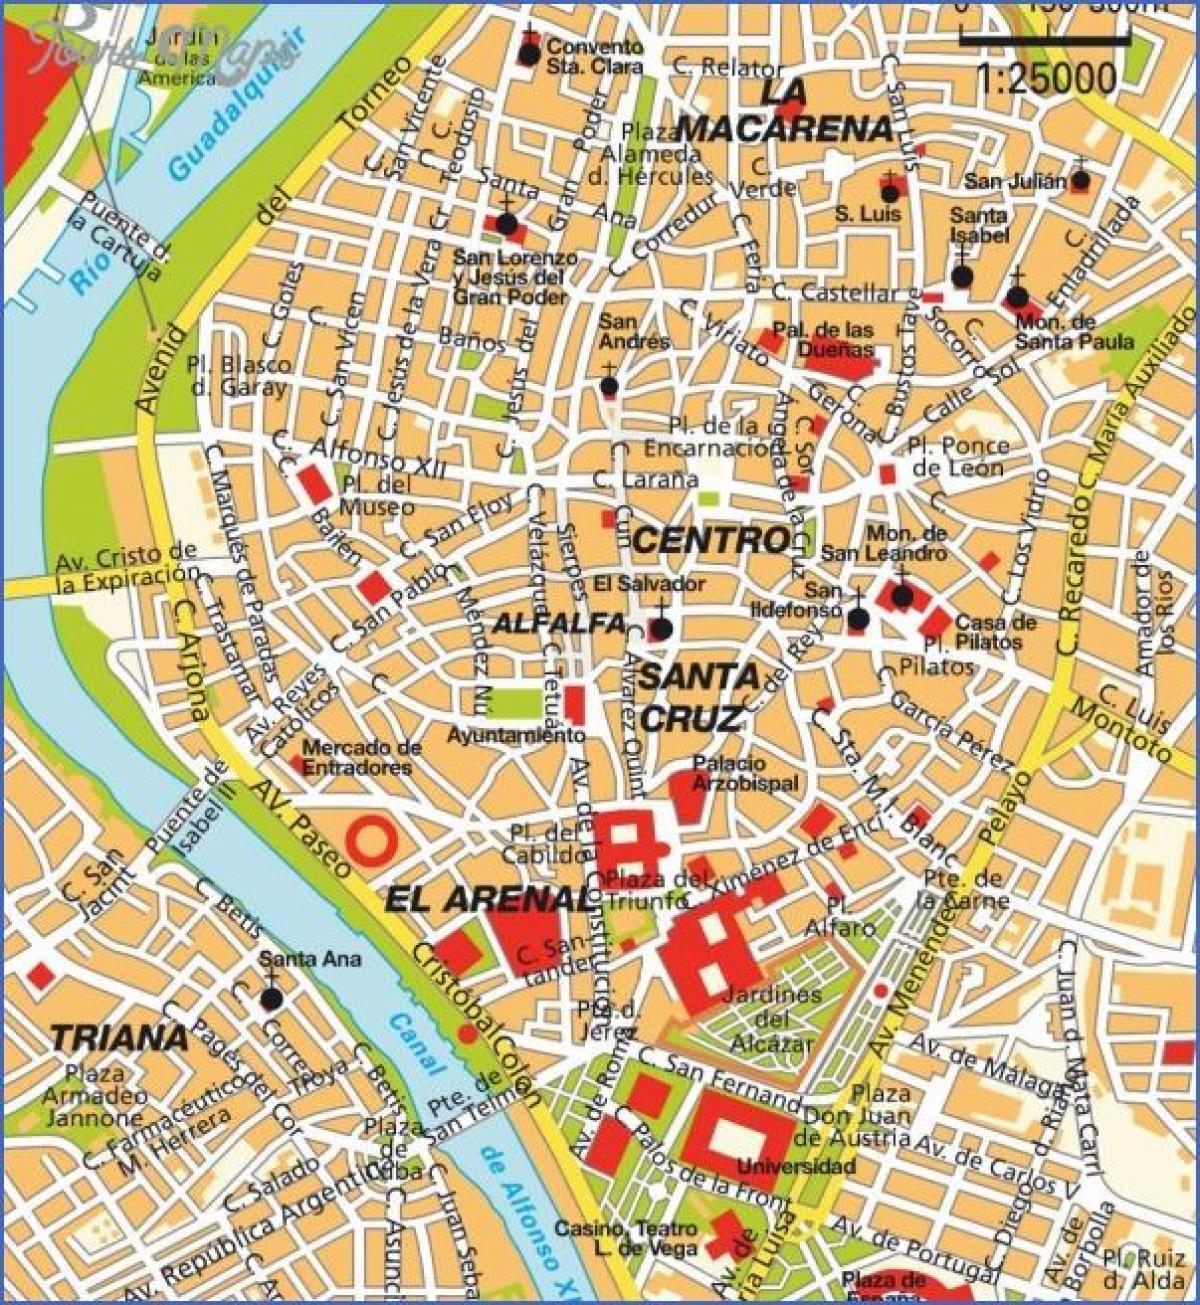 Sevilha Mapa Turistico Sevilha Pontos Turisticos Mapa Andaluzia